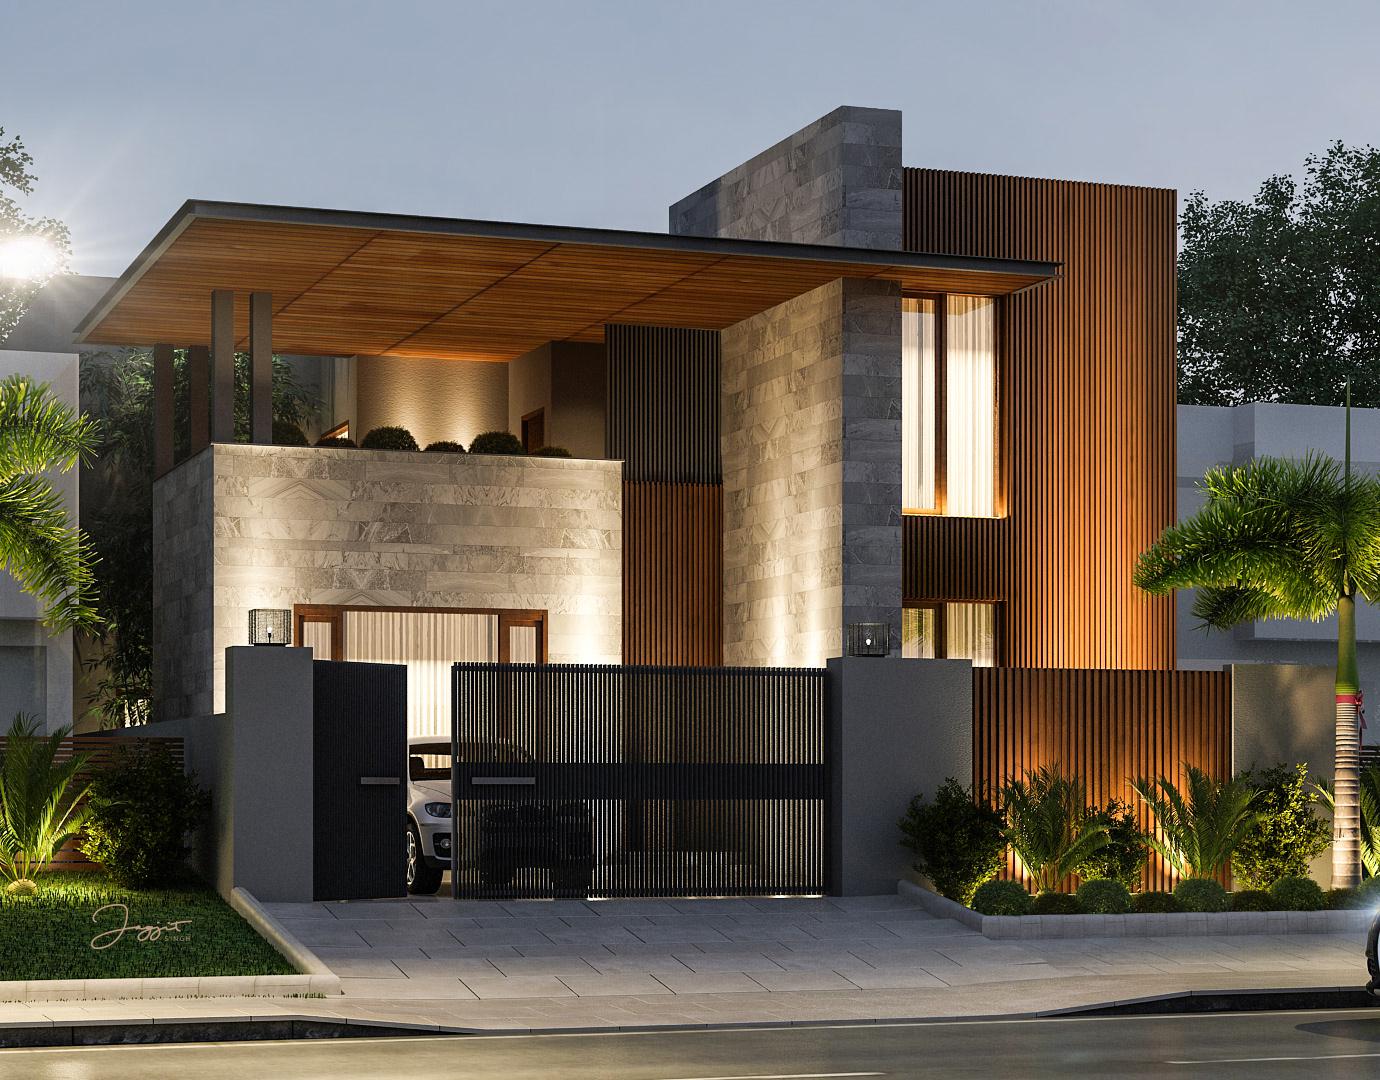 2ce4a81b3749ffcc472aae596ffb1a5f43e46cef01827764ee72f21a10c5cbf42a474a5c92280afa car 202x158 - Get Small Modern House Design Pinterest  Images